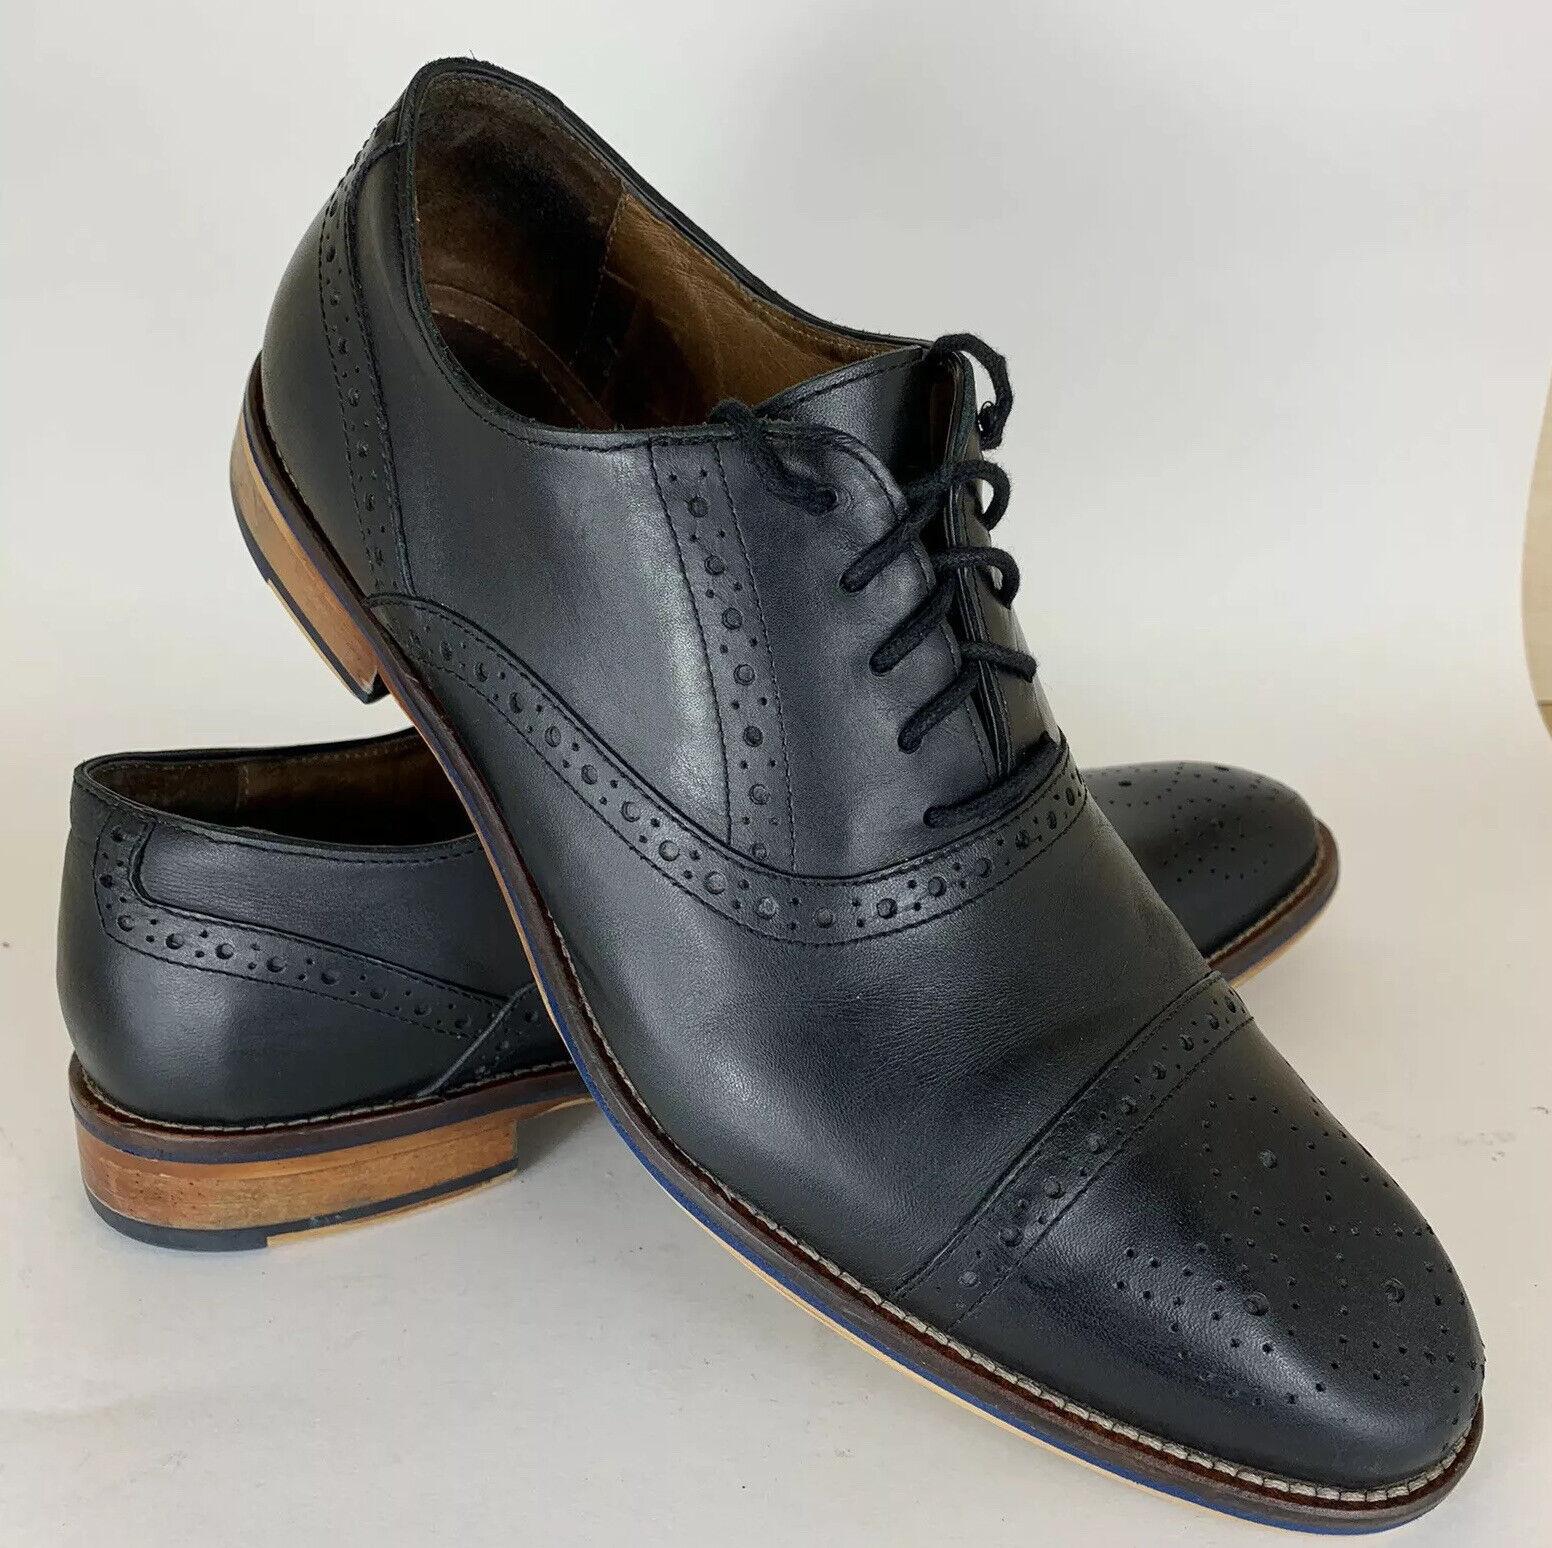 Johnston & Murphy 20-8681 Conard Black Leather Cap Toe Oxfords Mens 11 M Brogue